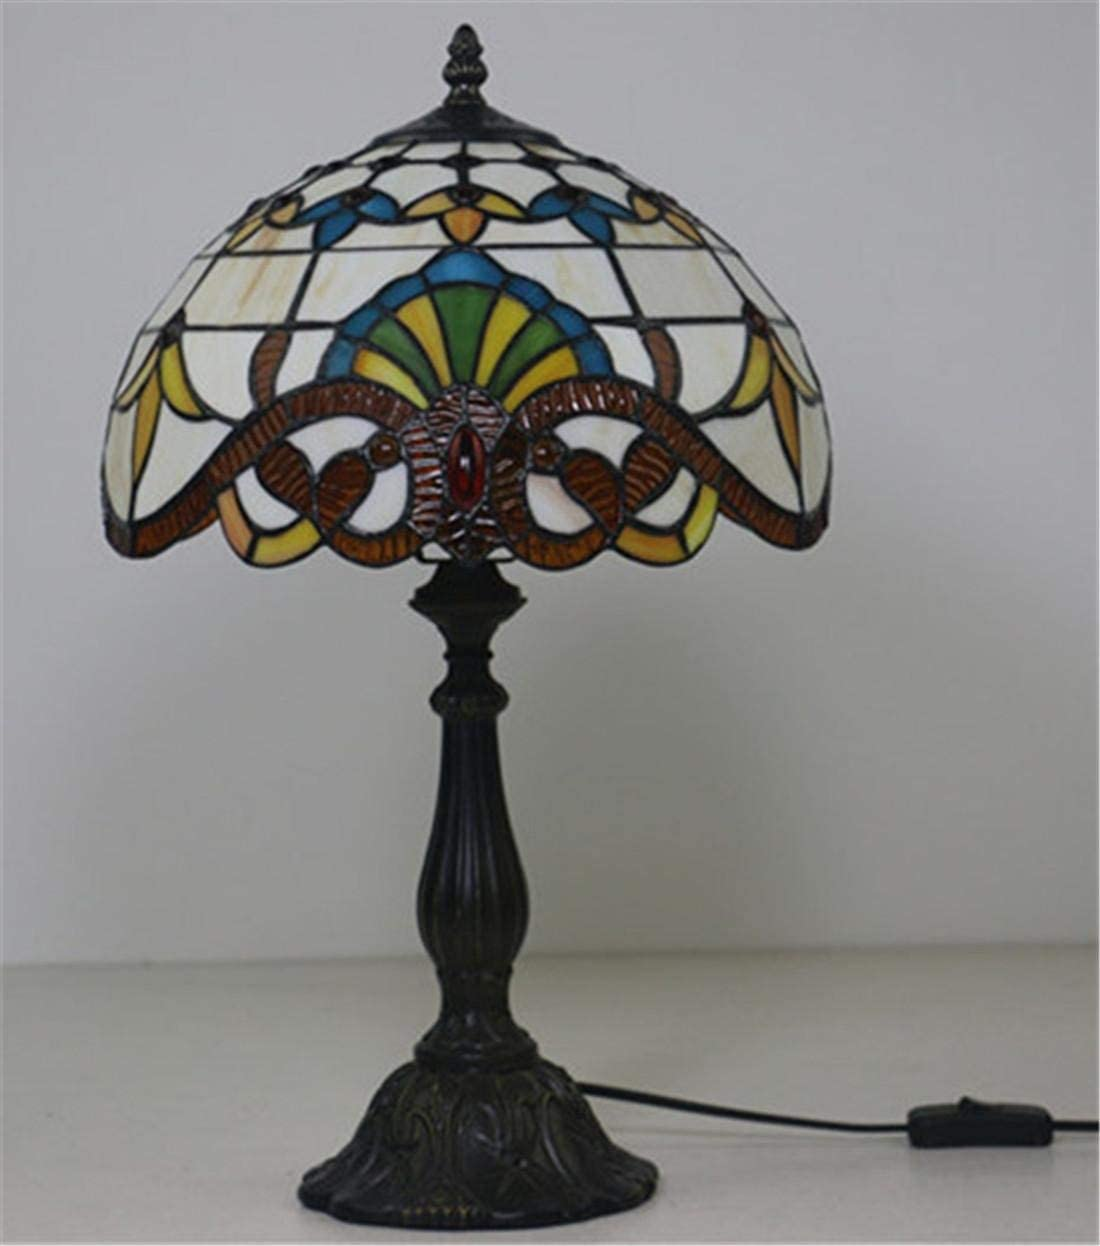 BOSSLV Continental Retro Nostalgia Creative E27 Study Bar Wedding Room Café Parlor Bedchamber Bedside Lamp 2542Cm